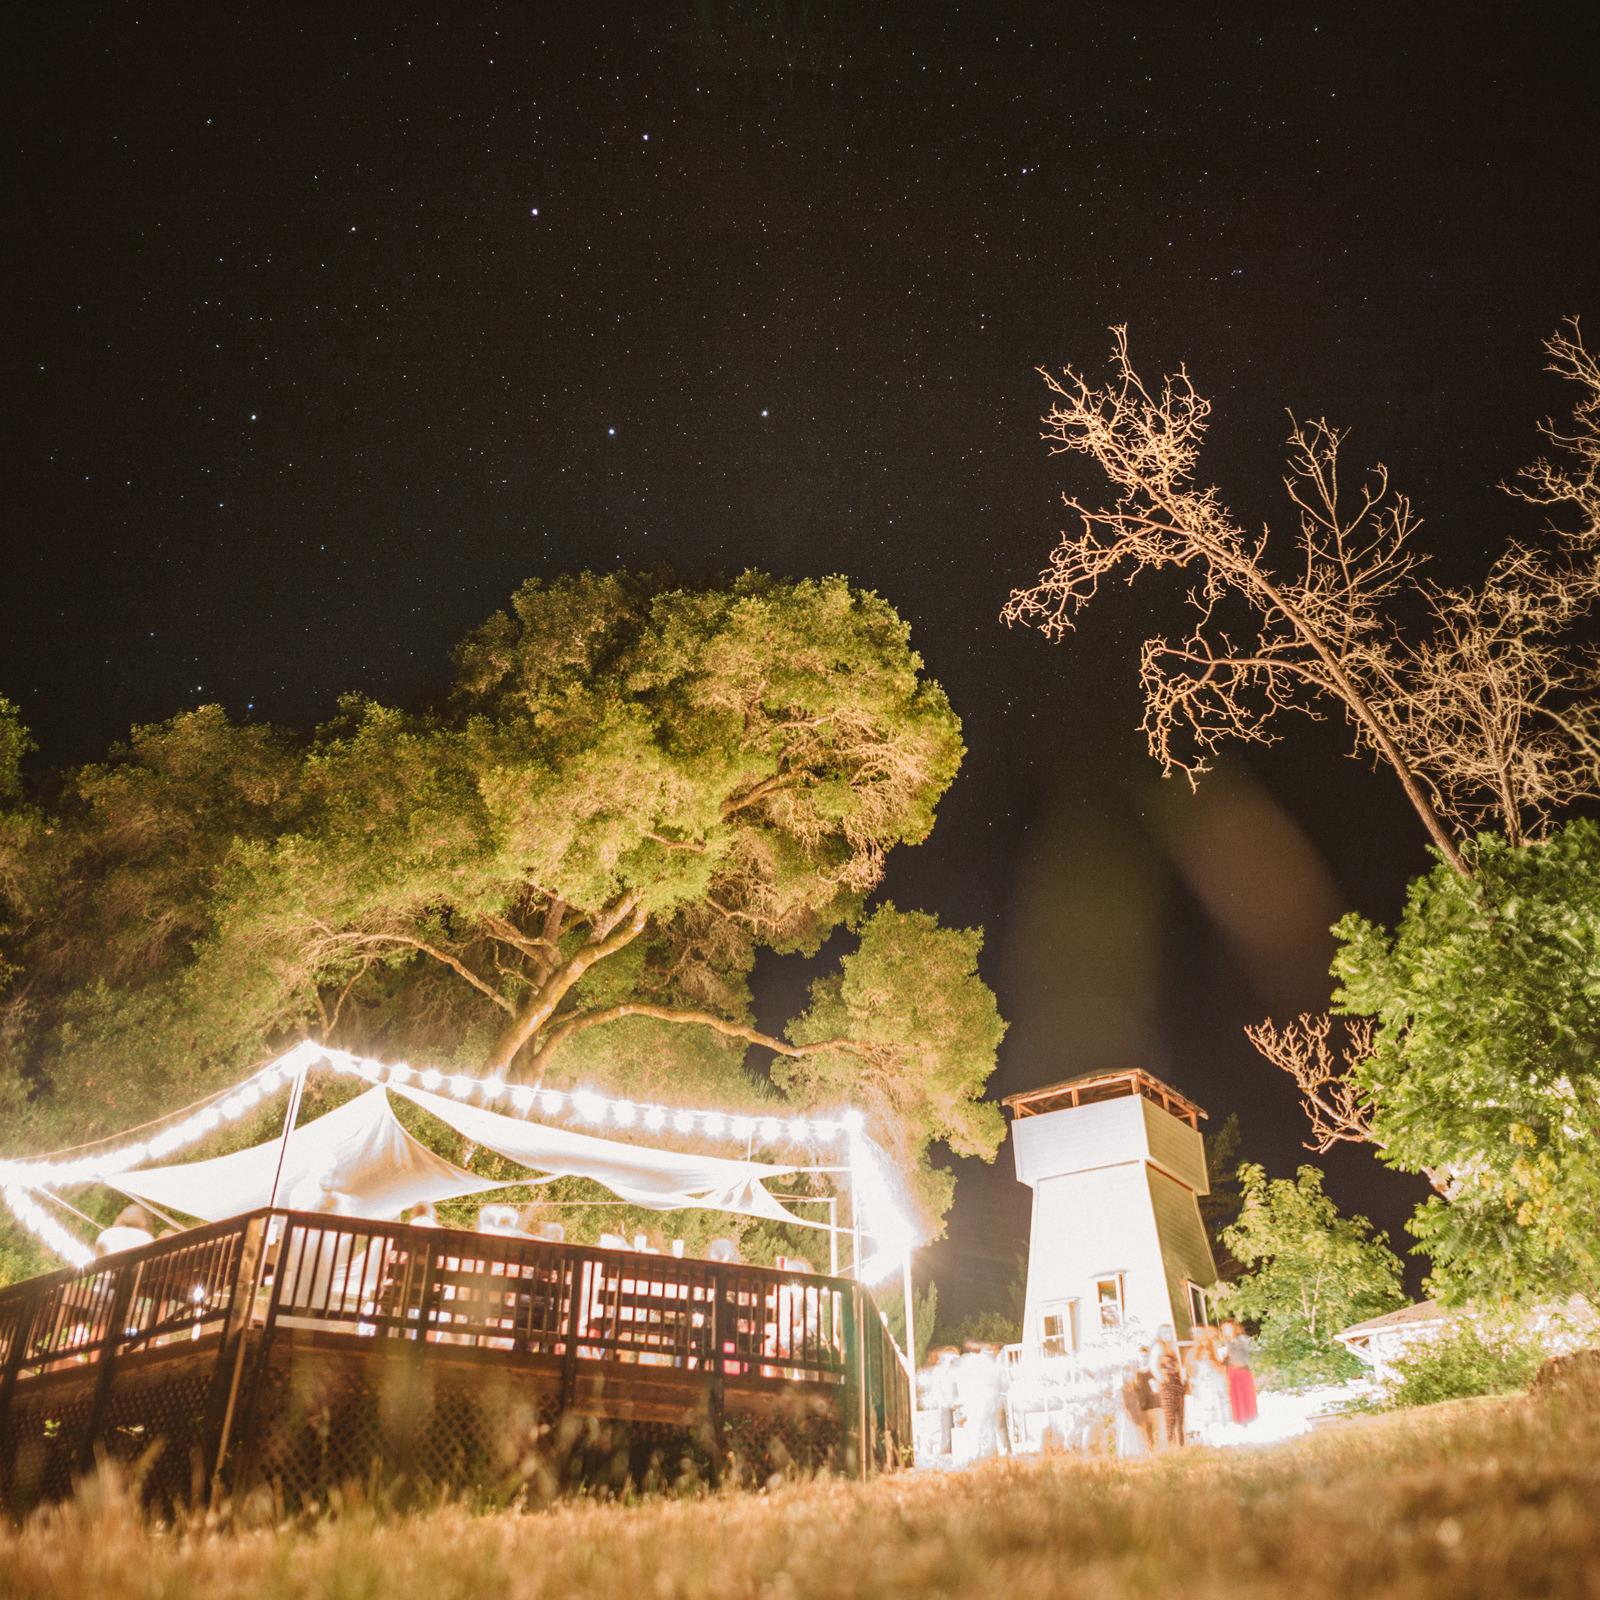 rivers-bend-retreat-wedding-124 RIVER'S BEND RETREAT WEDDING